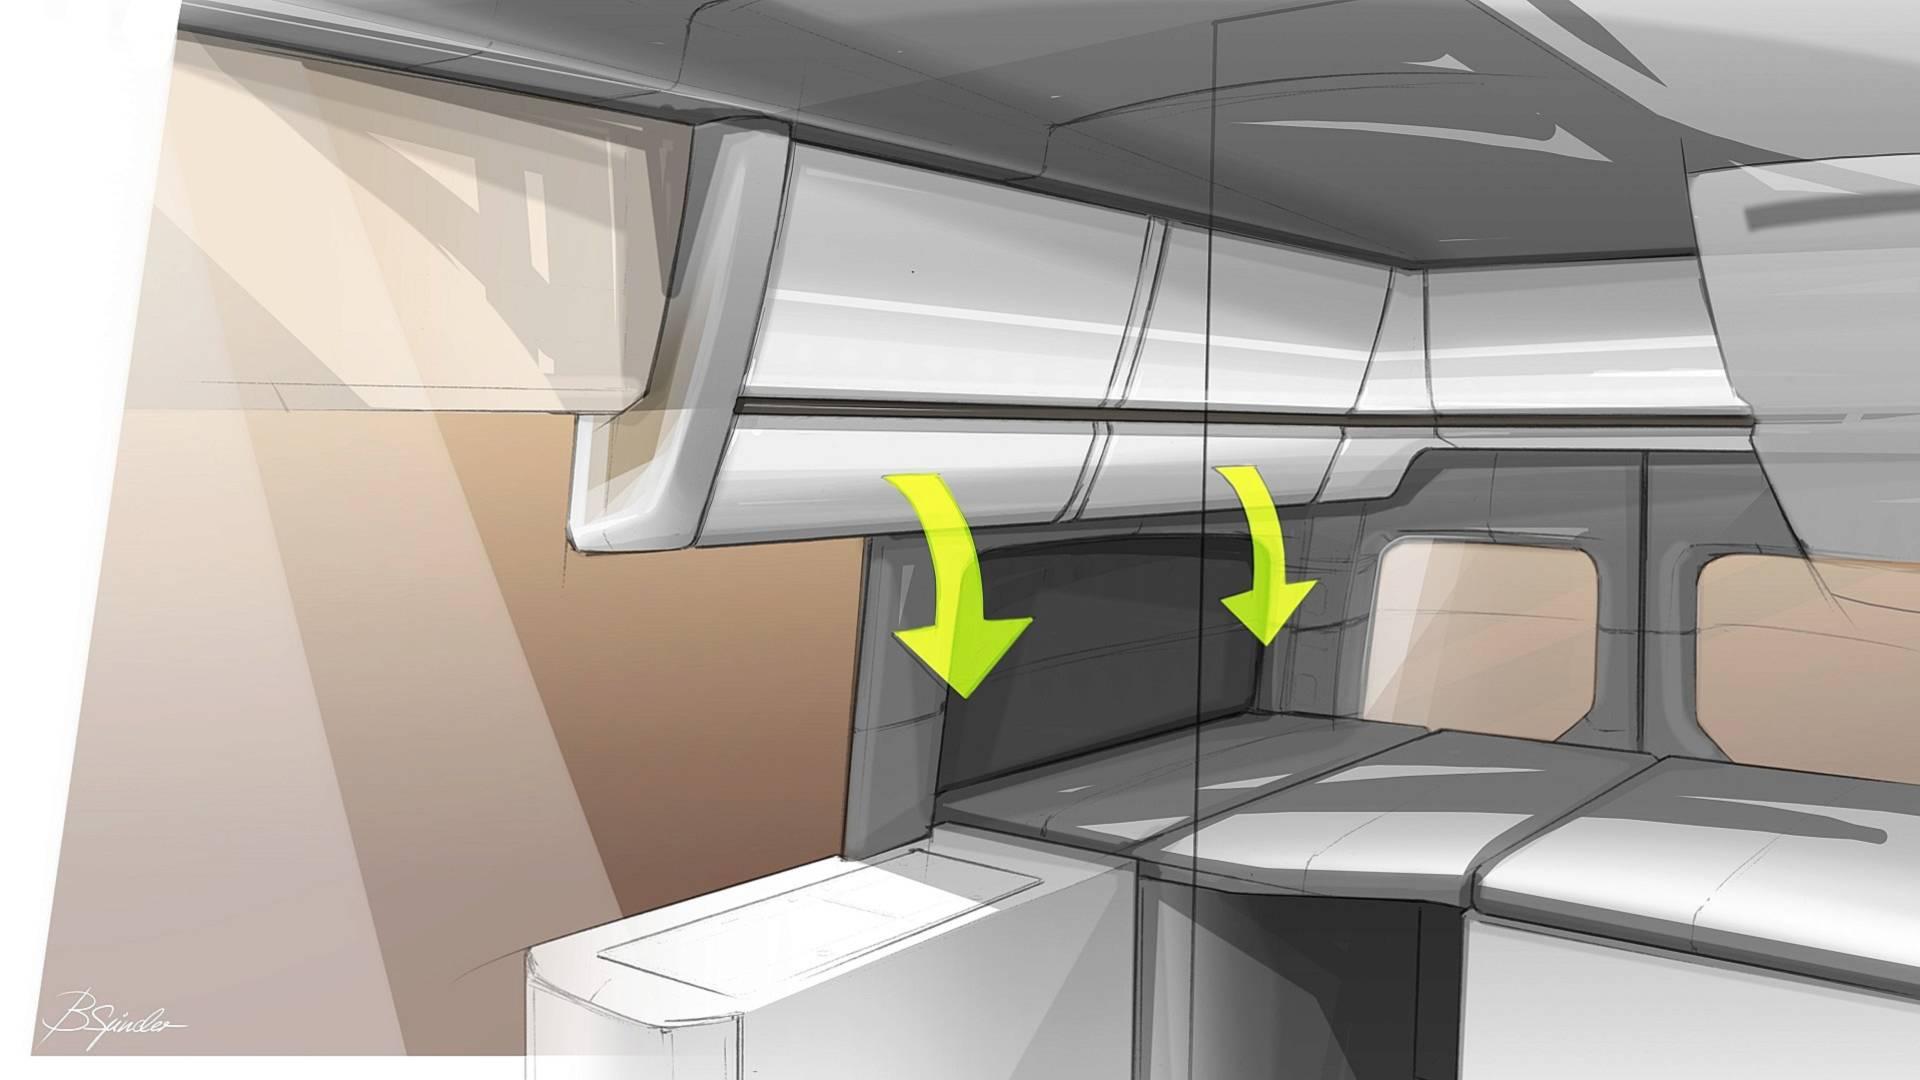 Vw Teases Production Ready California Xxl Camper Van